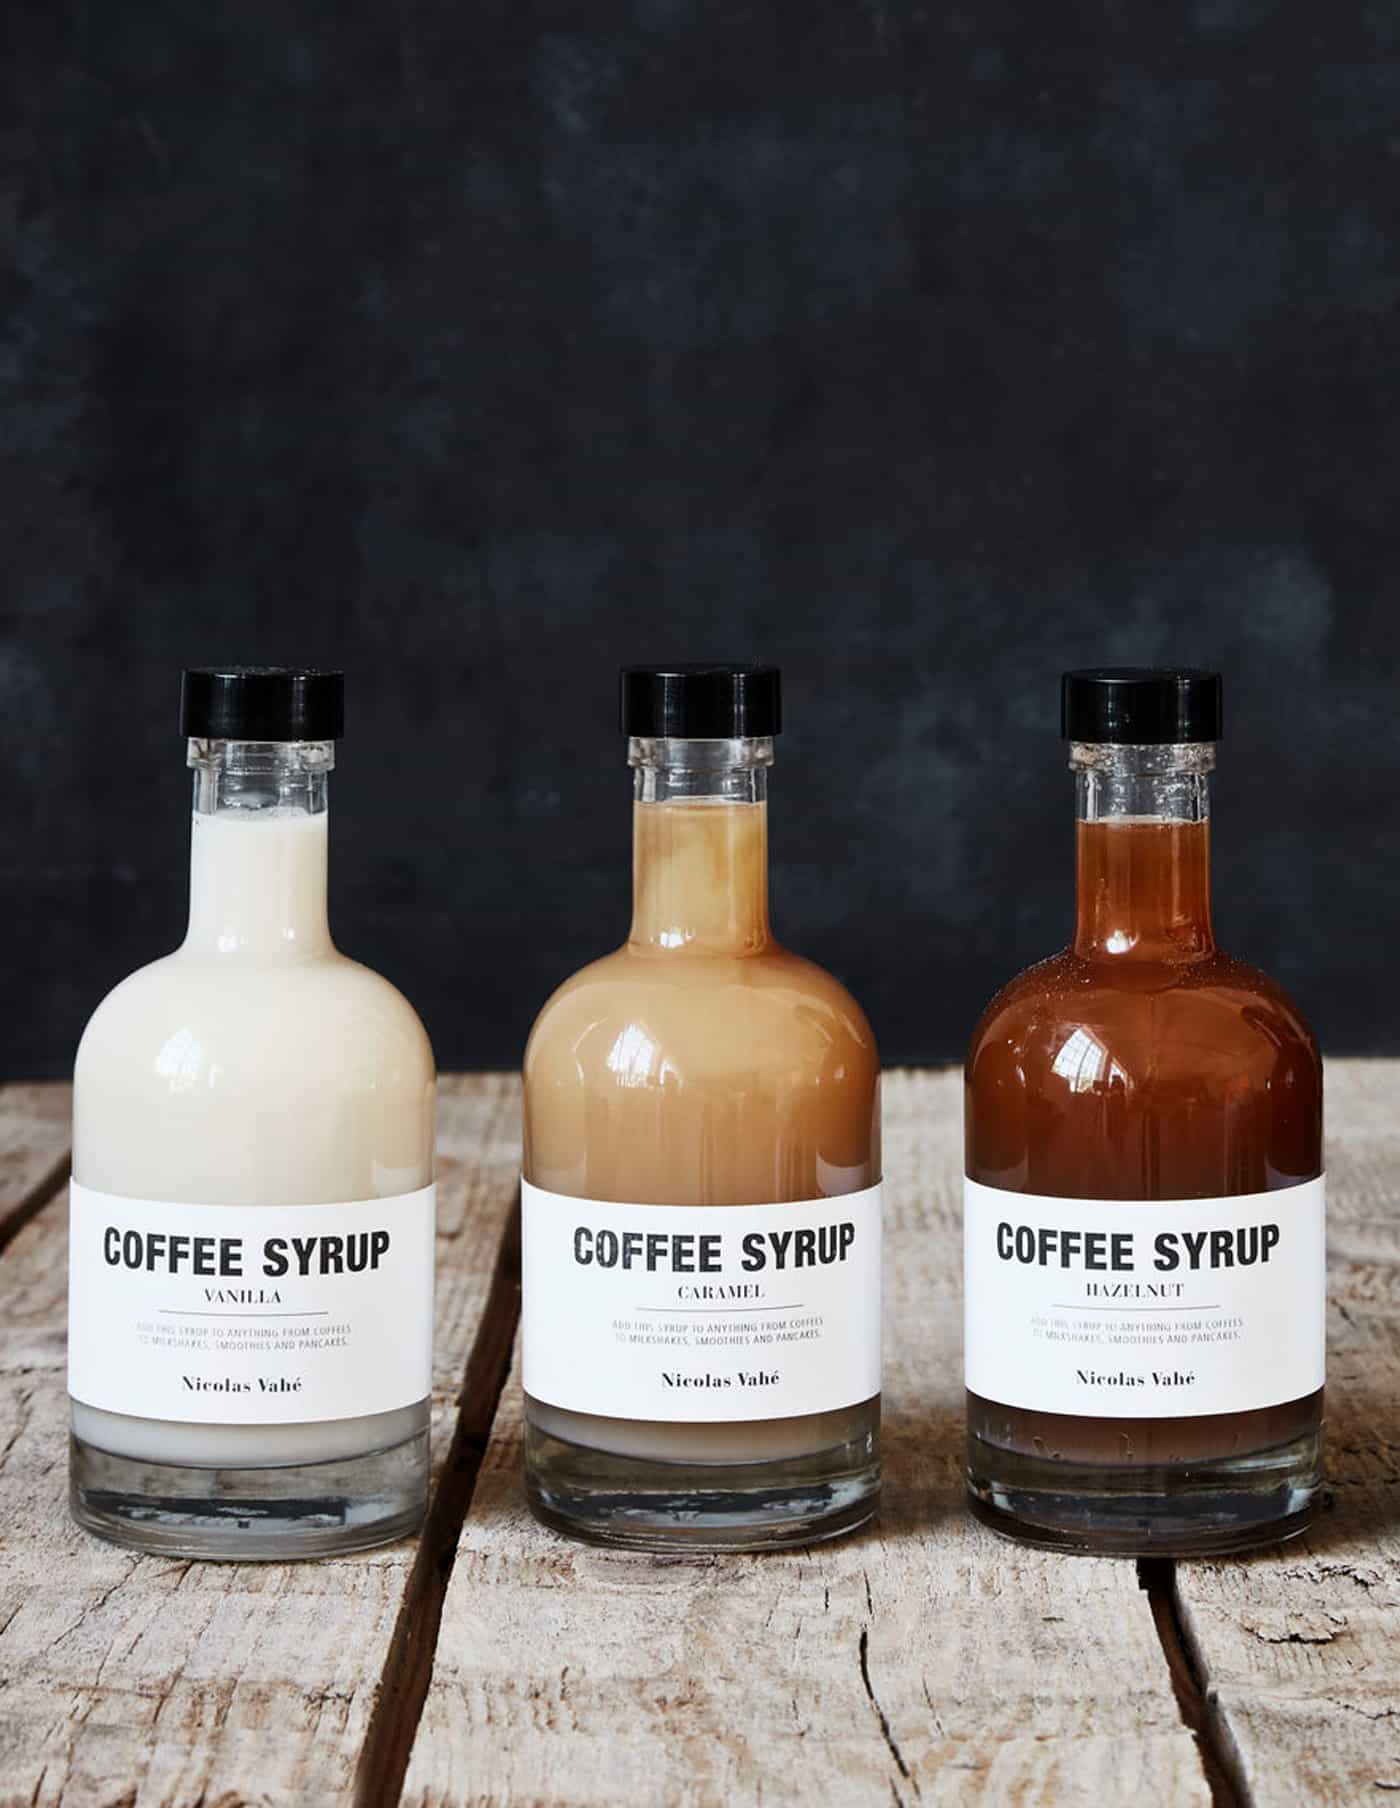 Caramel Coffee Syrup, Nicolas Vahé